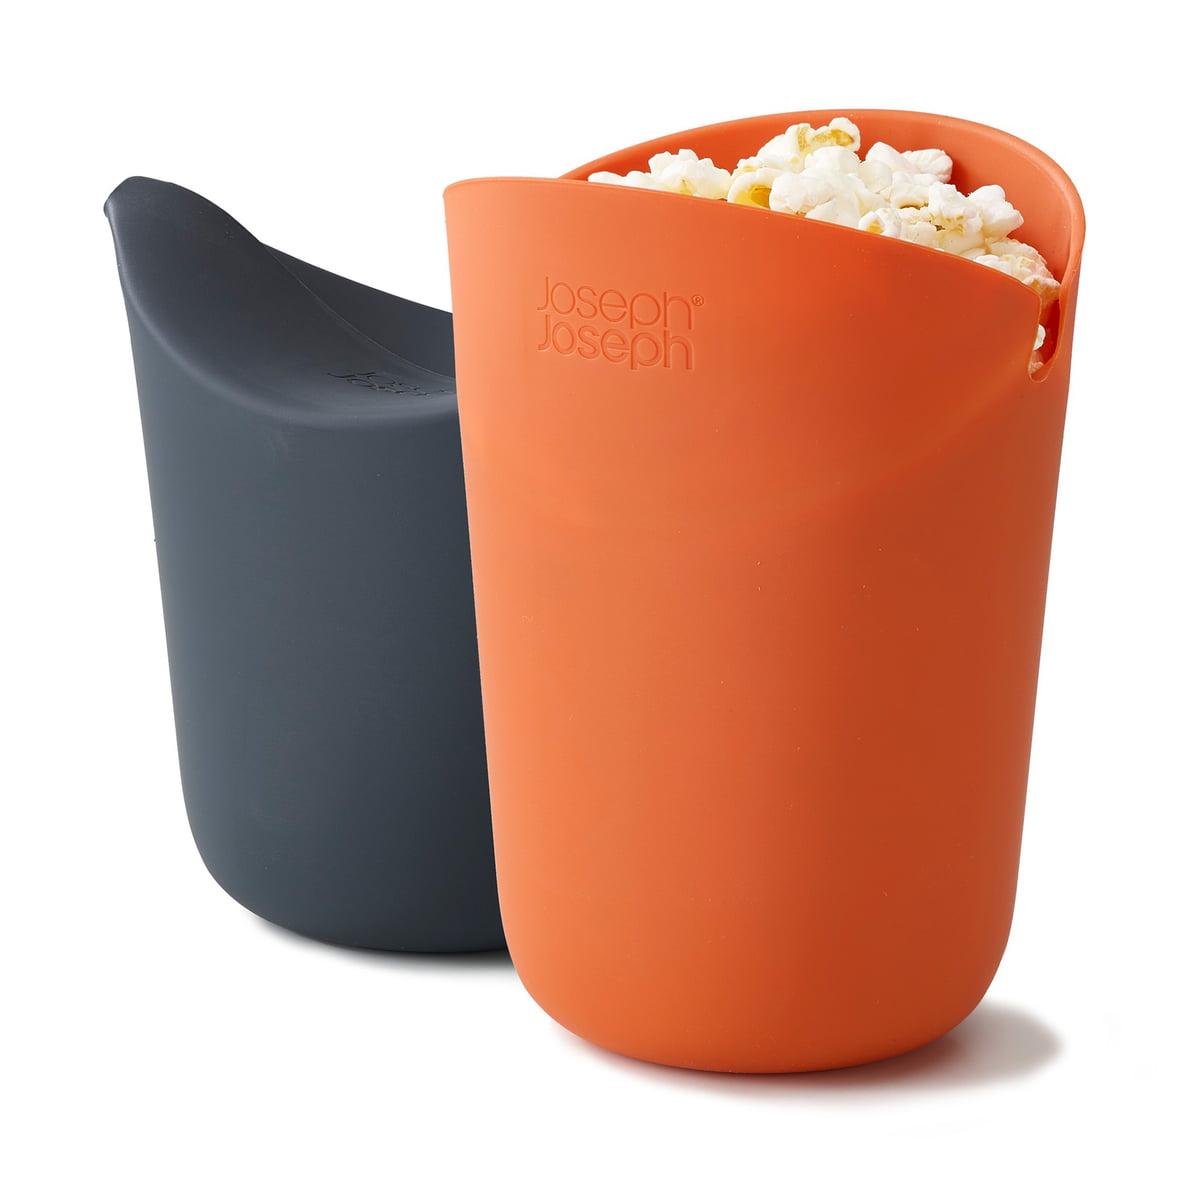 m cuisine popcorn maker set of 2 by joseph joseph. Black Bedroom Furniture Sets. Home Design Ideas